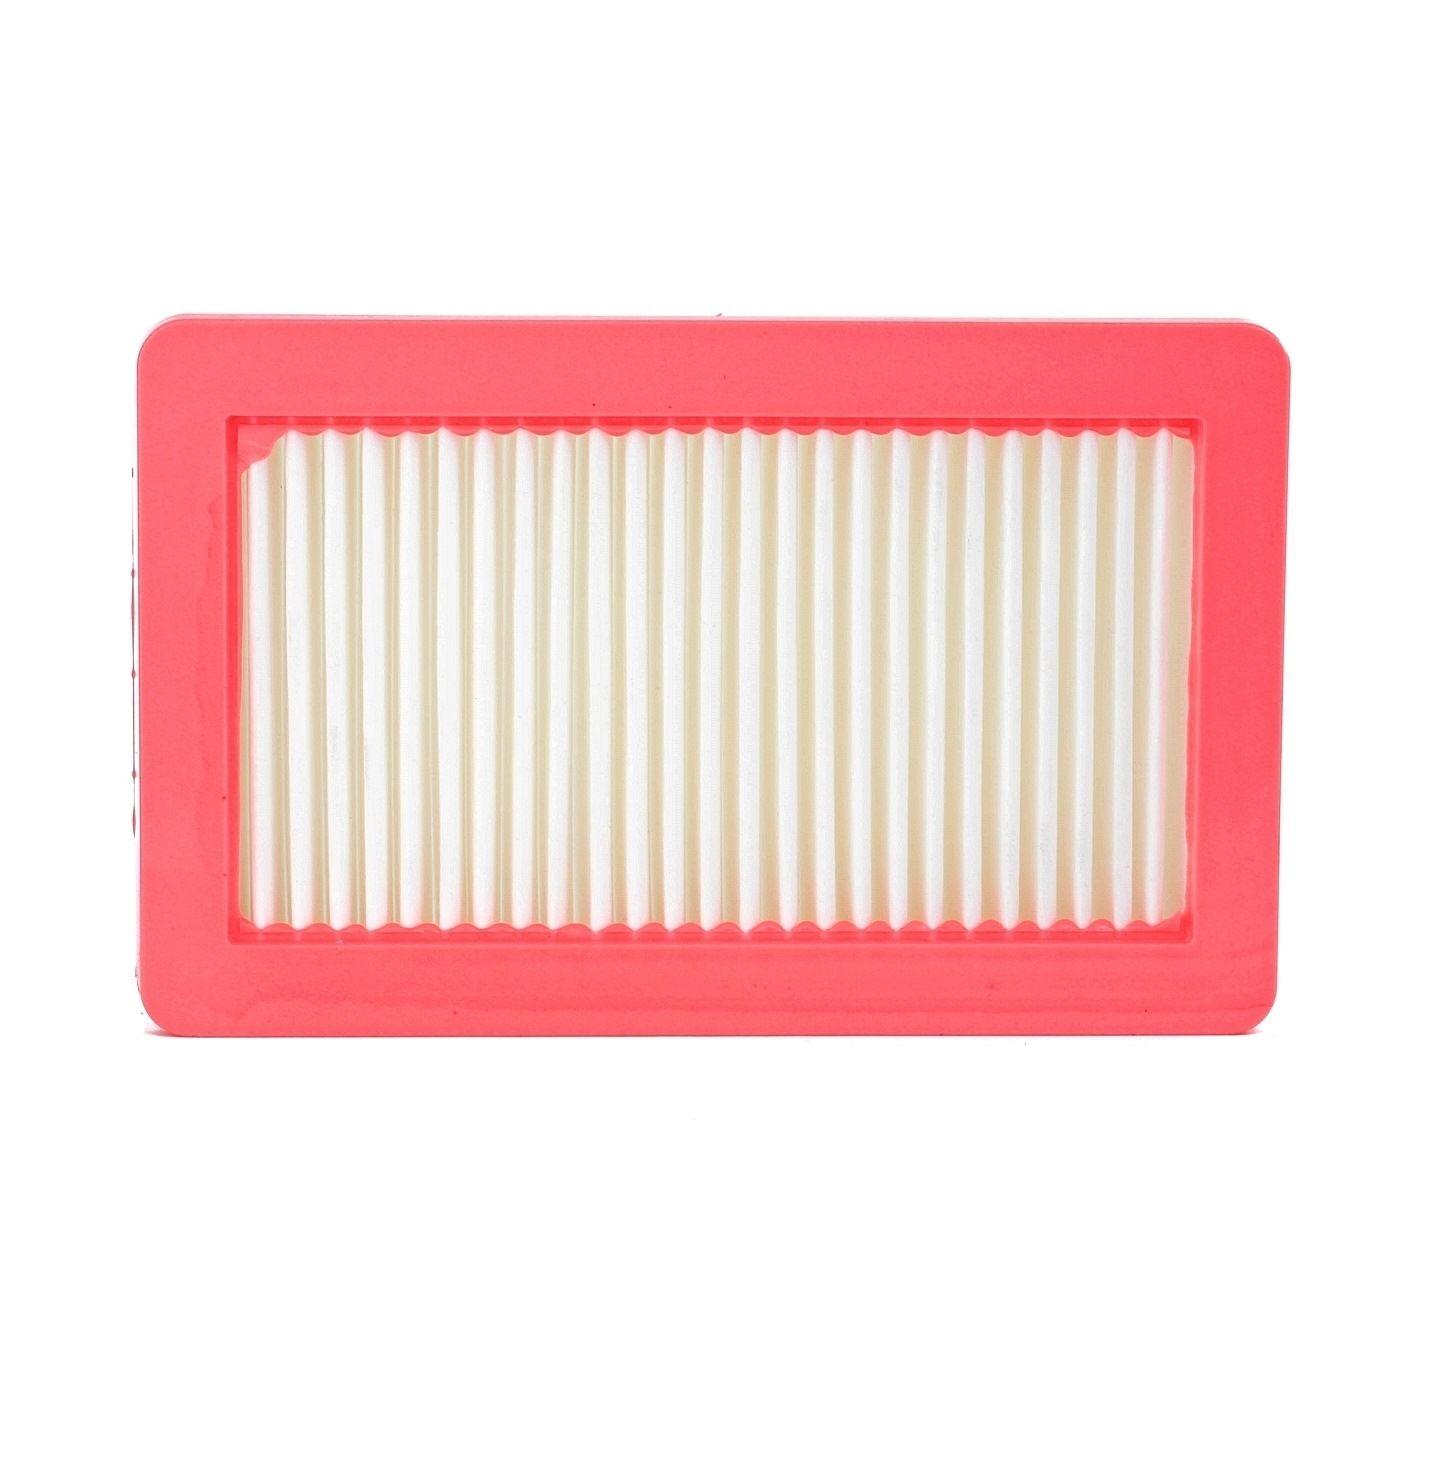 Original Zracni filter 8A0734 Smart